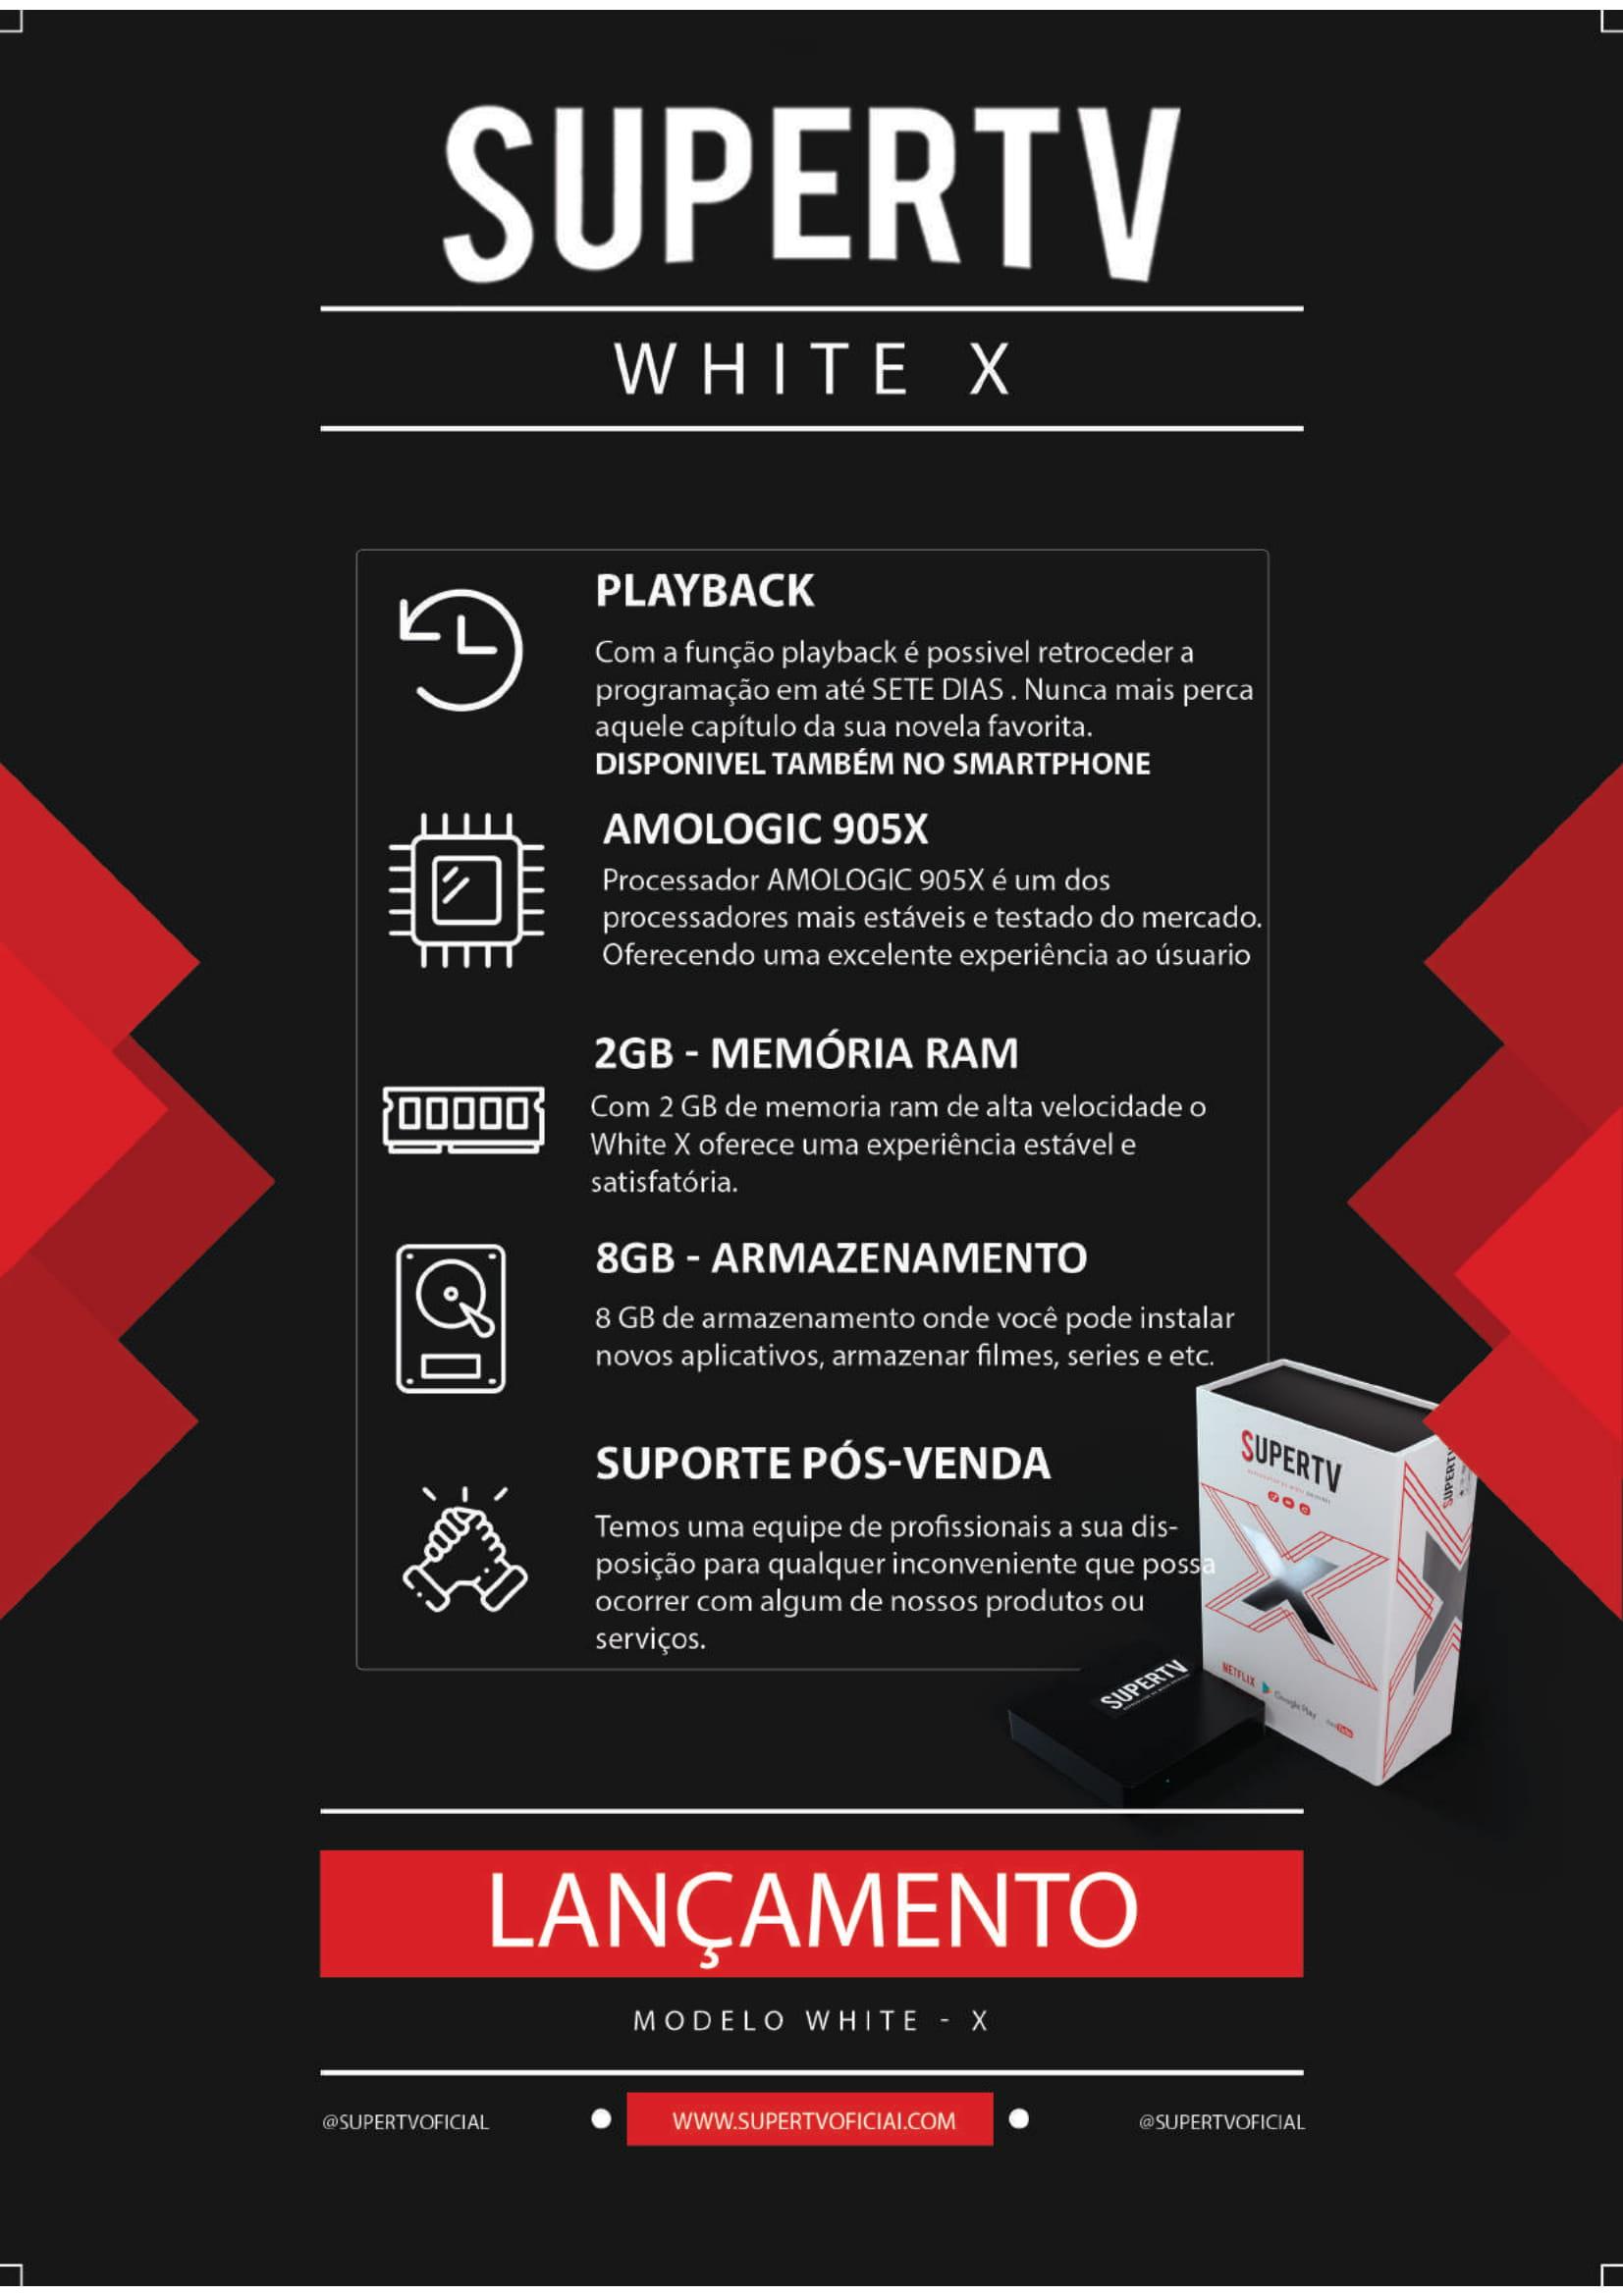 white-x-pdf-3.jpg